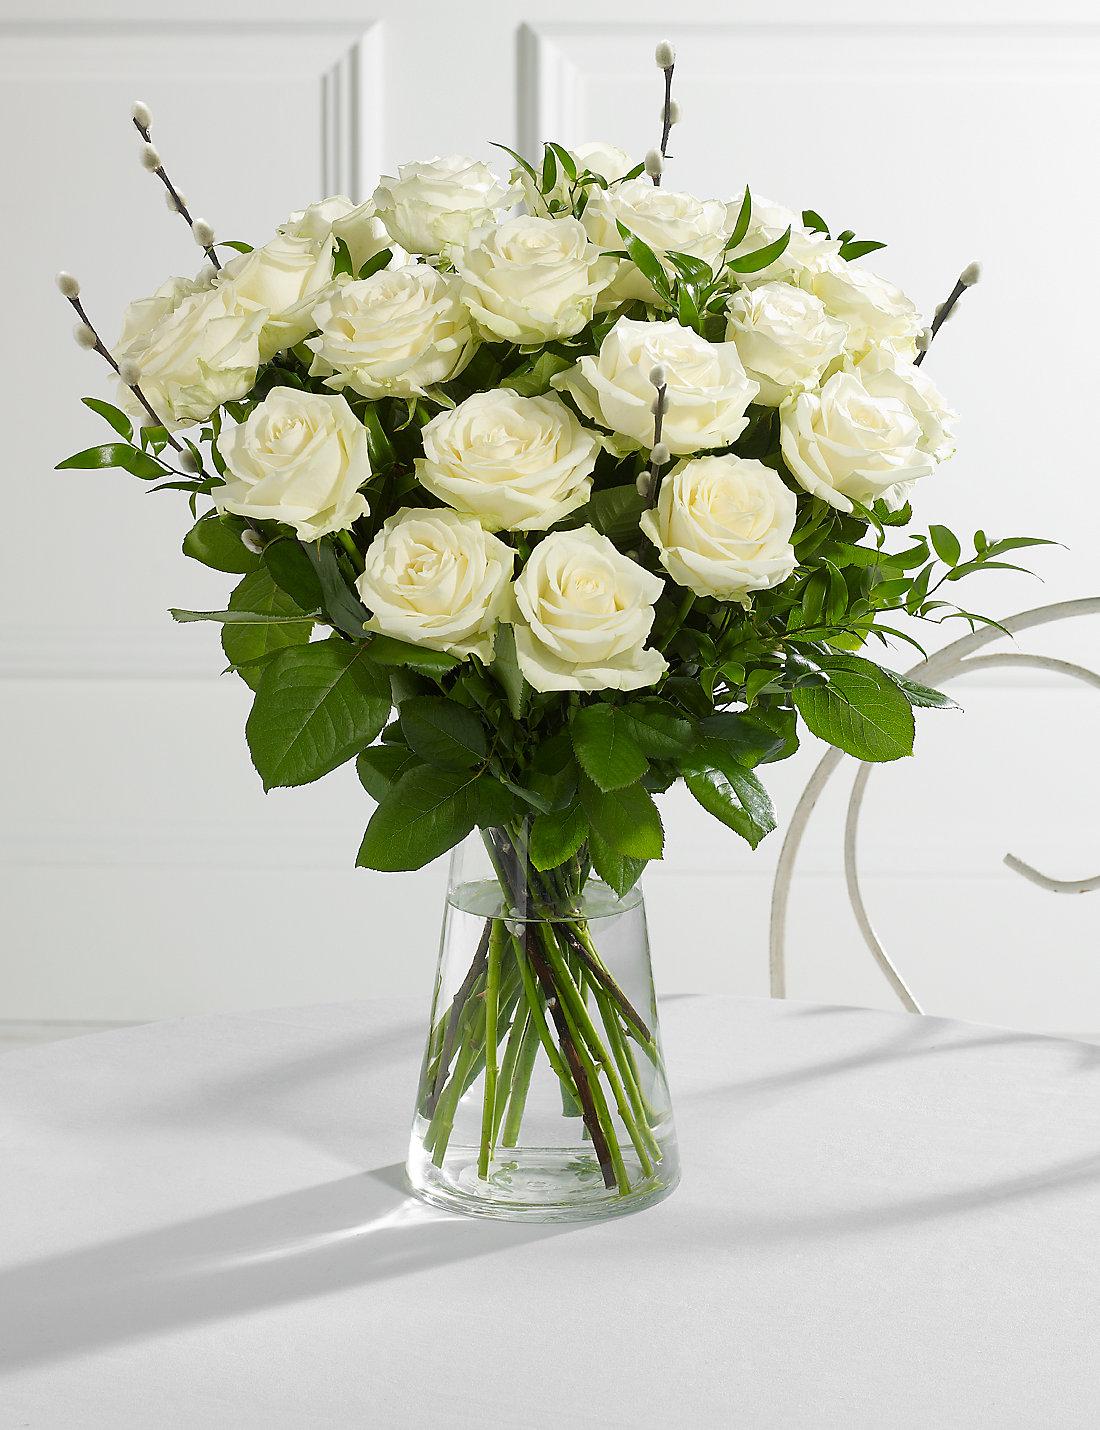 Flower vase arrangement ms flower vase arrangement reviewsmspy